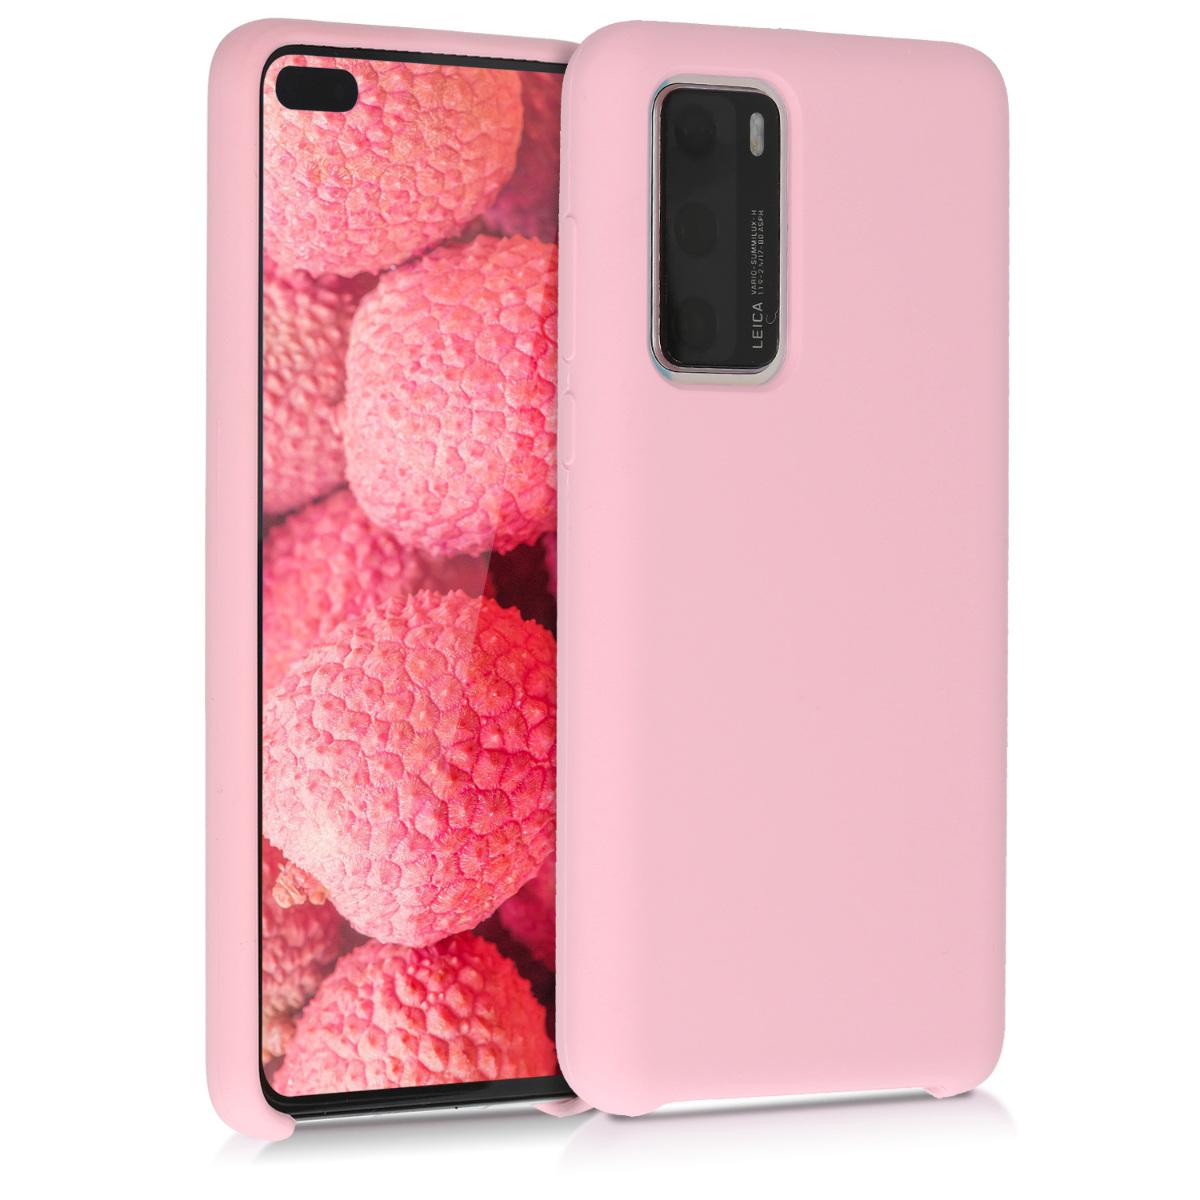 Matné růžové silikonové pouzdro / obal pro Huawei P40